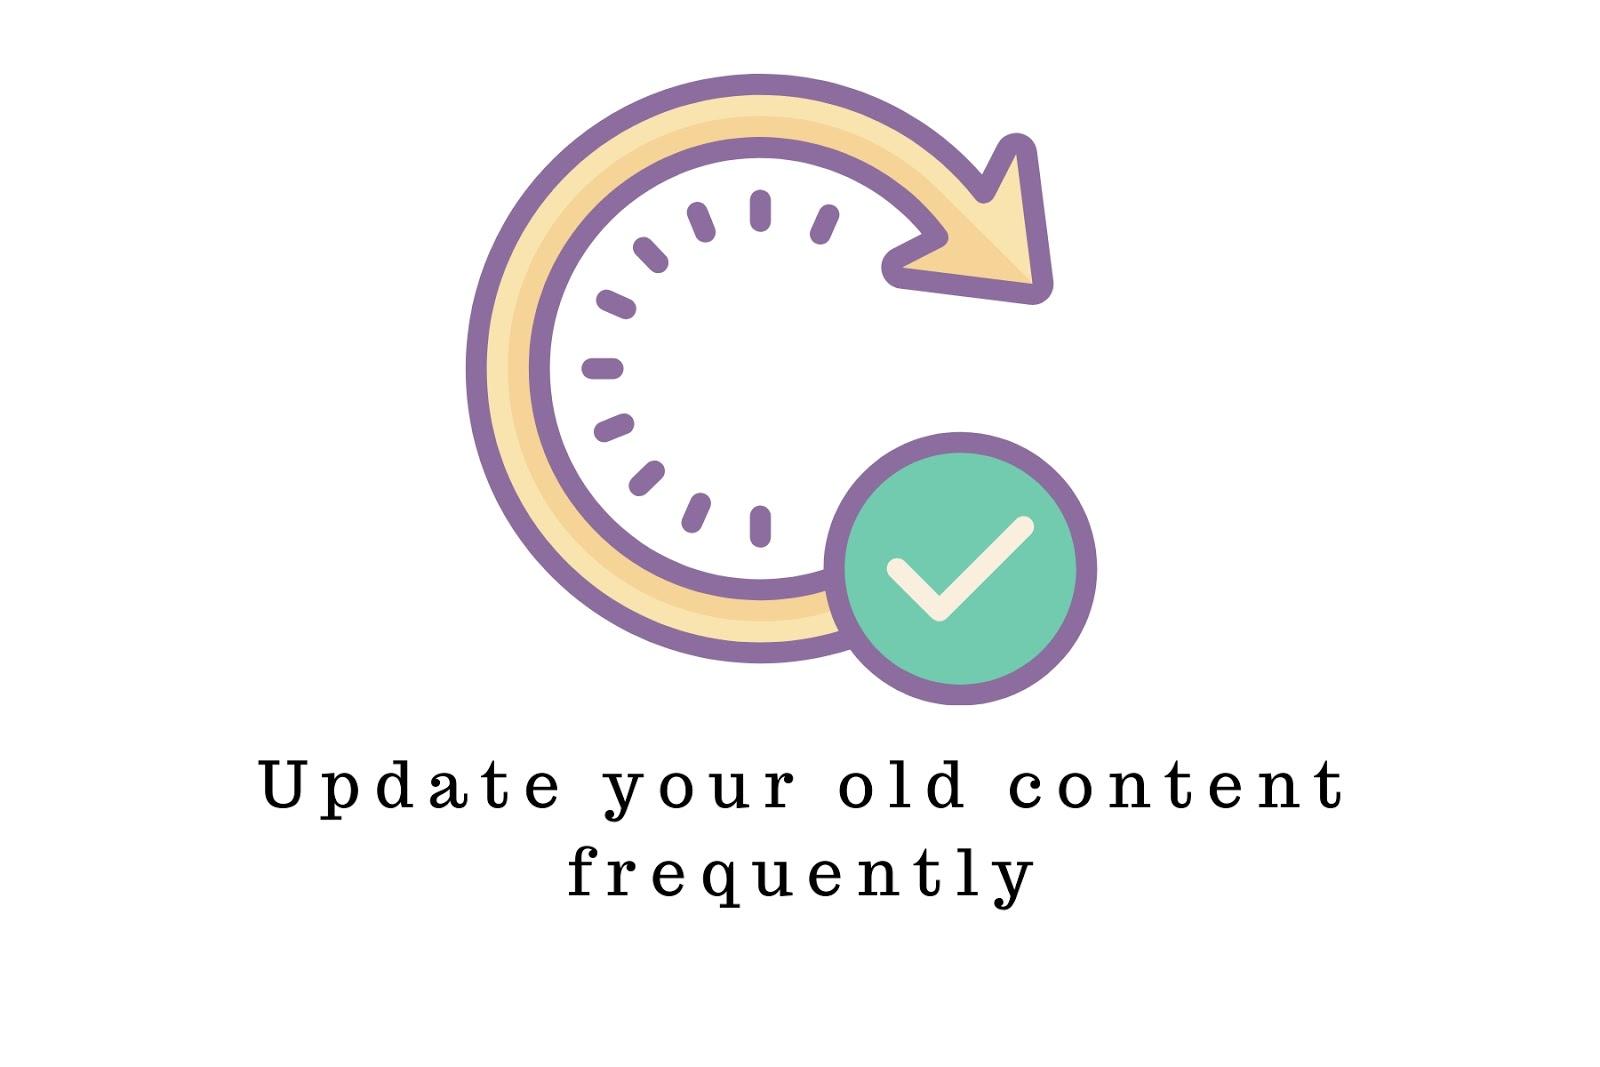 User friendly seo content